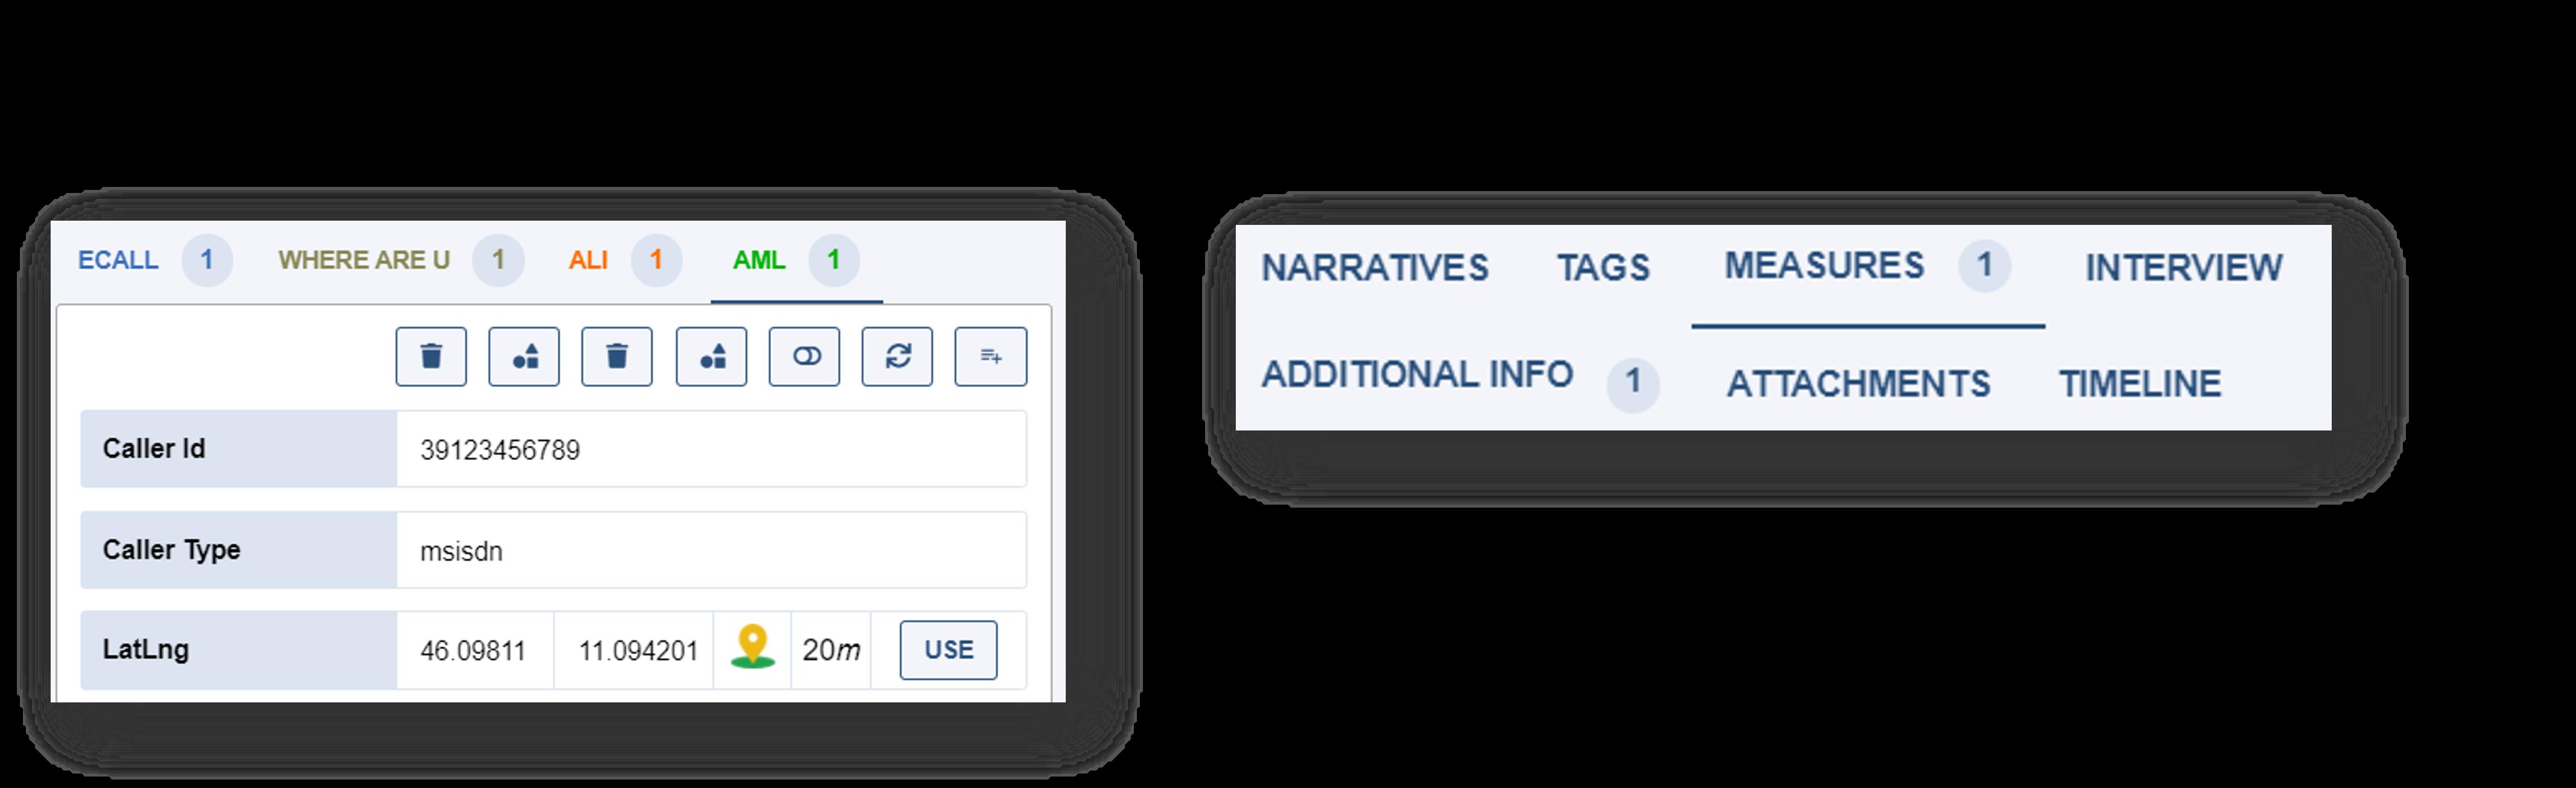 user interface it